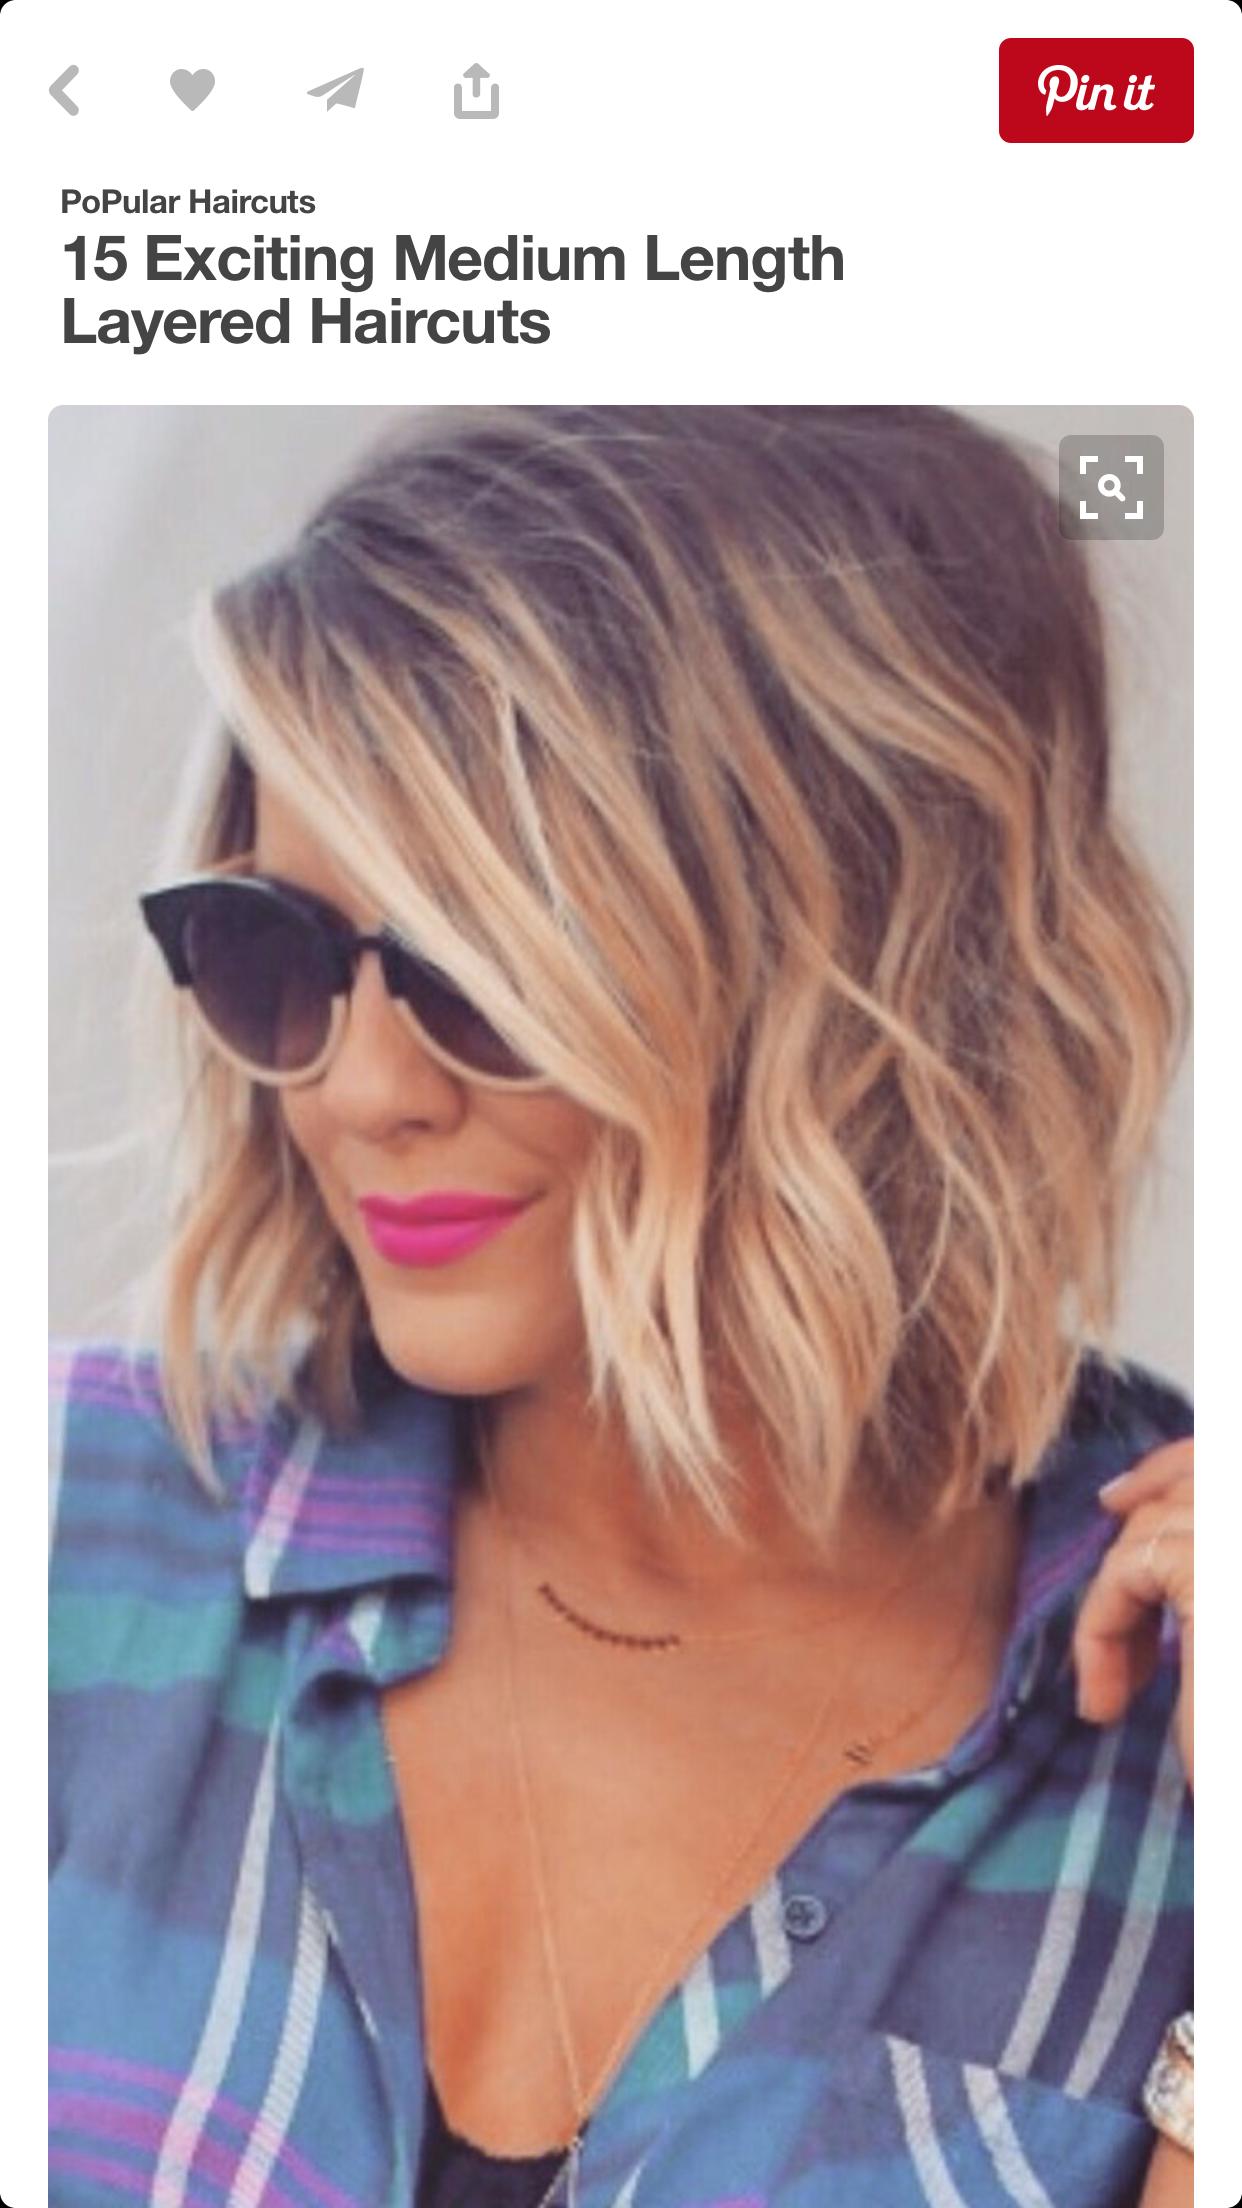 pin by andrea gleason on hair cut 2015 | pinterest | short hair